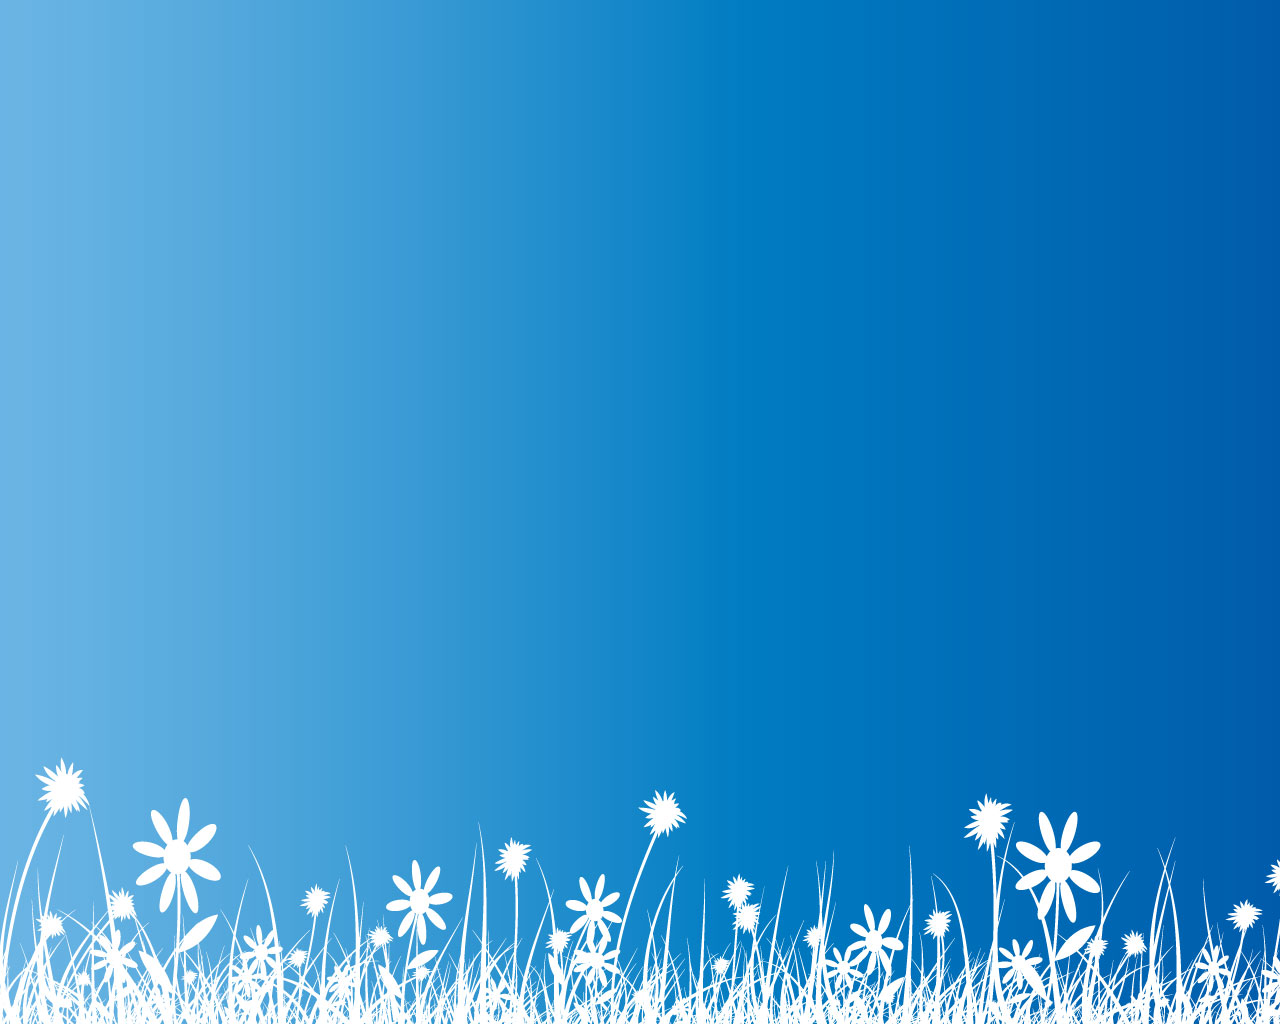 IMAGES GOOGLE IMAGES BEST GOOGLE IMAGES background image 1280x1024